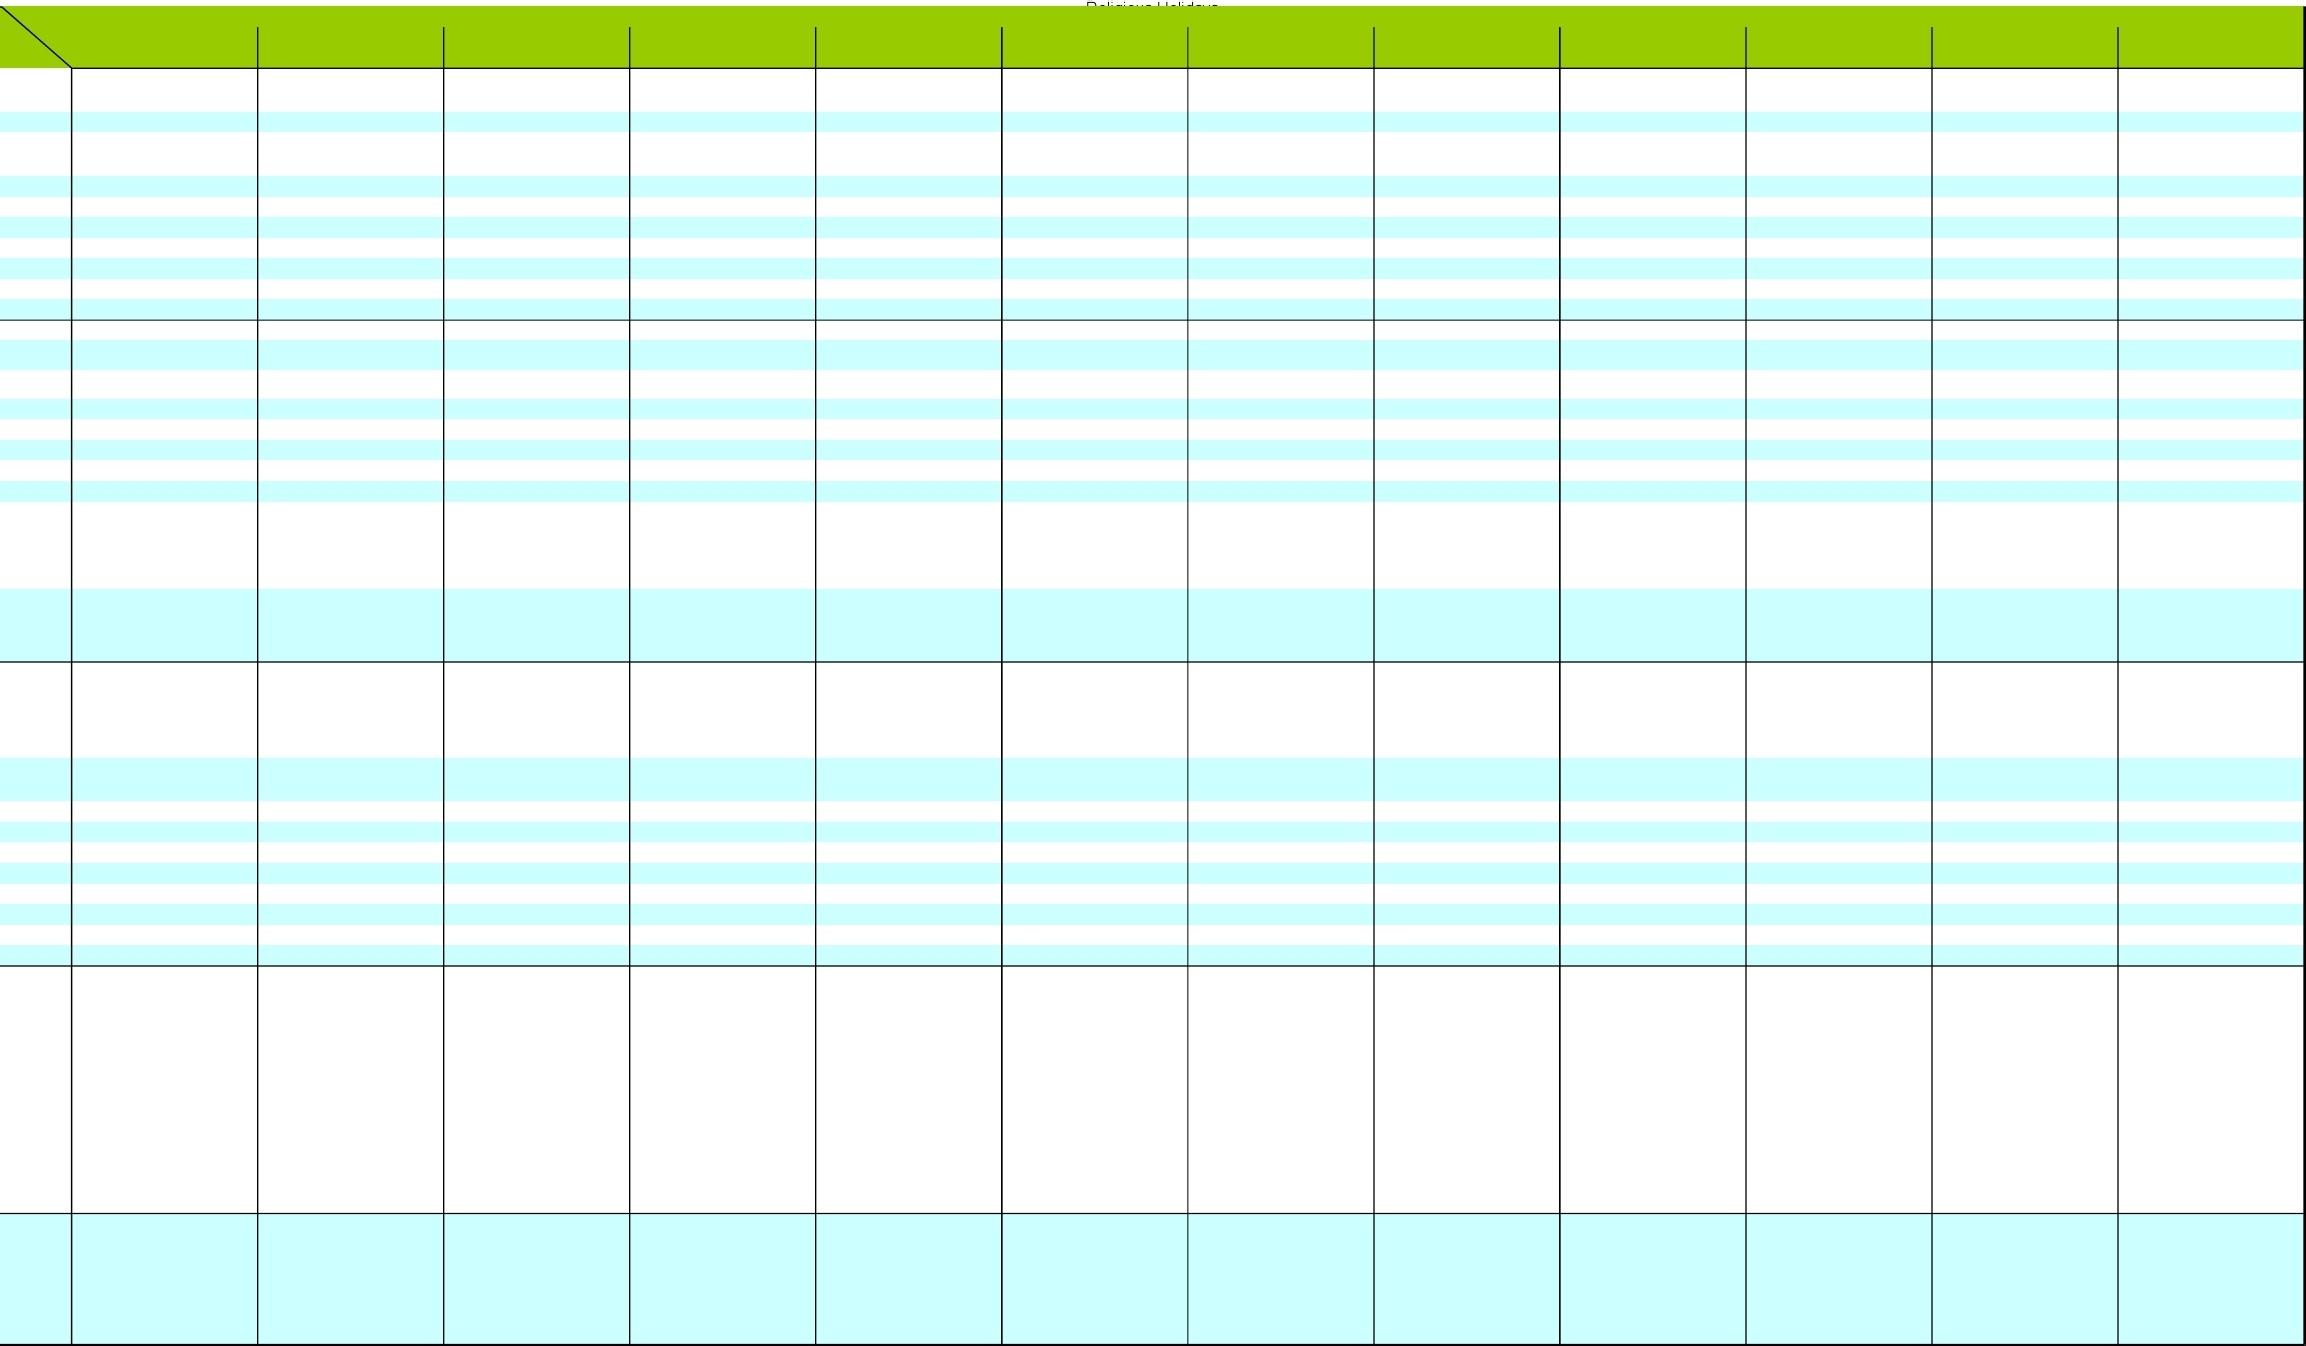 Calendar Of Harptos - [Xlsx Document]